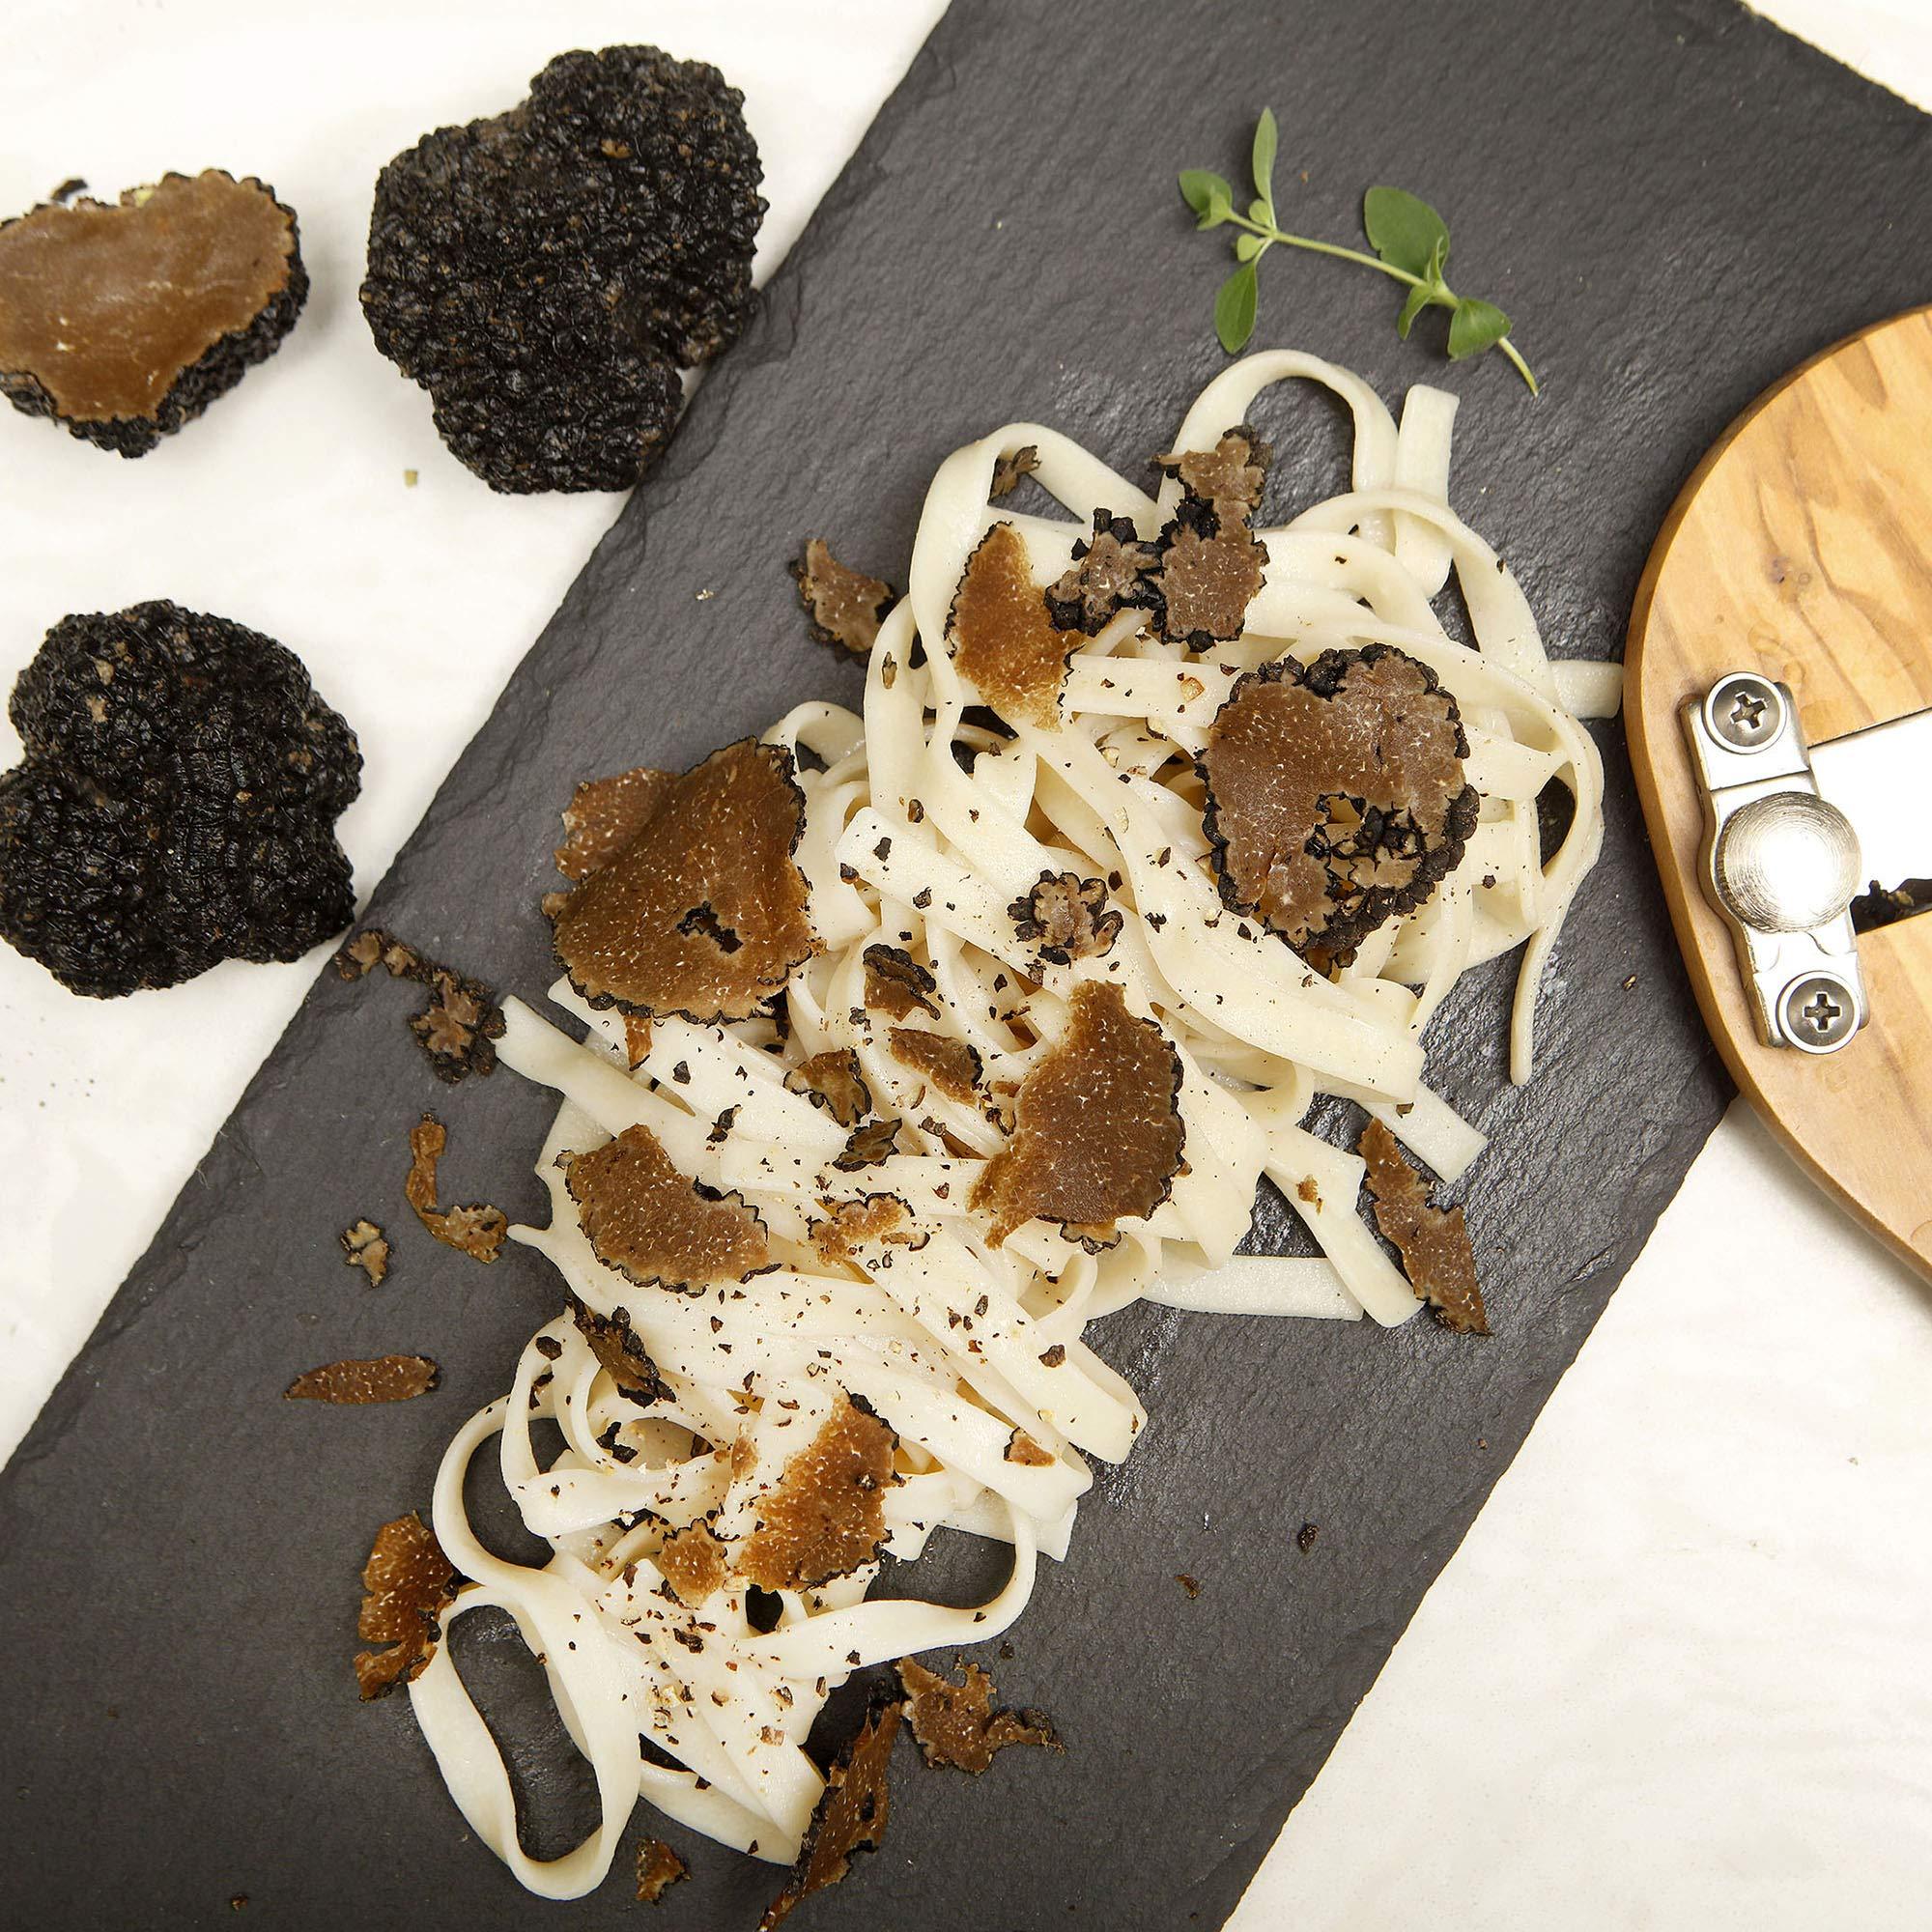 TRUFFLES USA Whole Black Truffles 1.76 oz by TRUFFLES USA (Image #3)